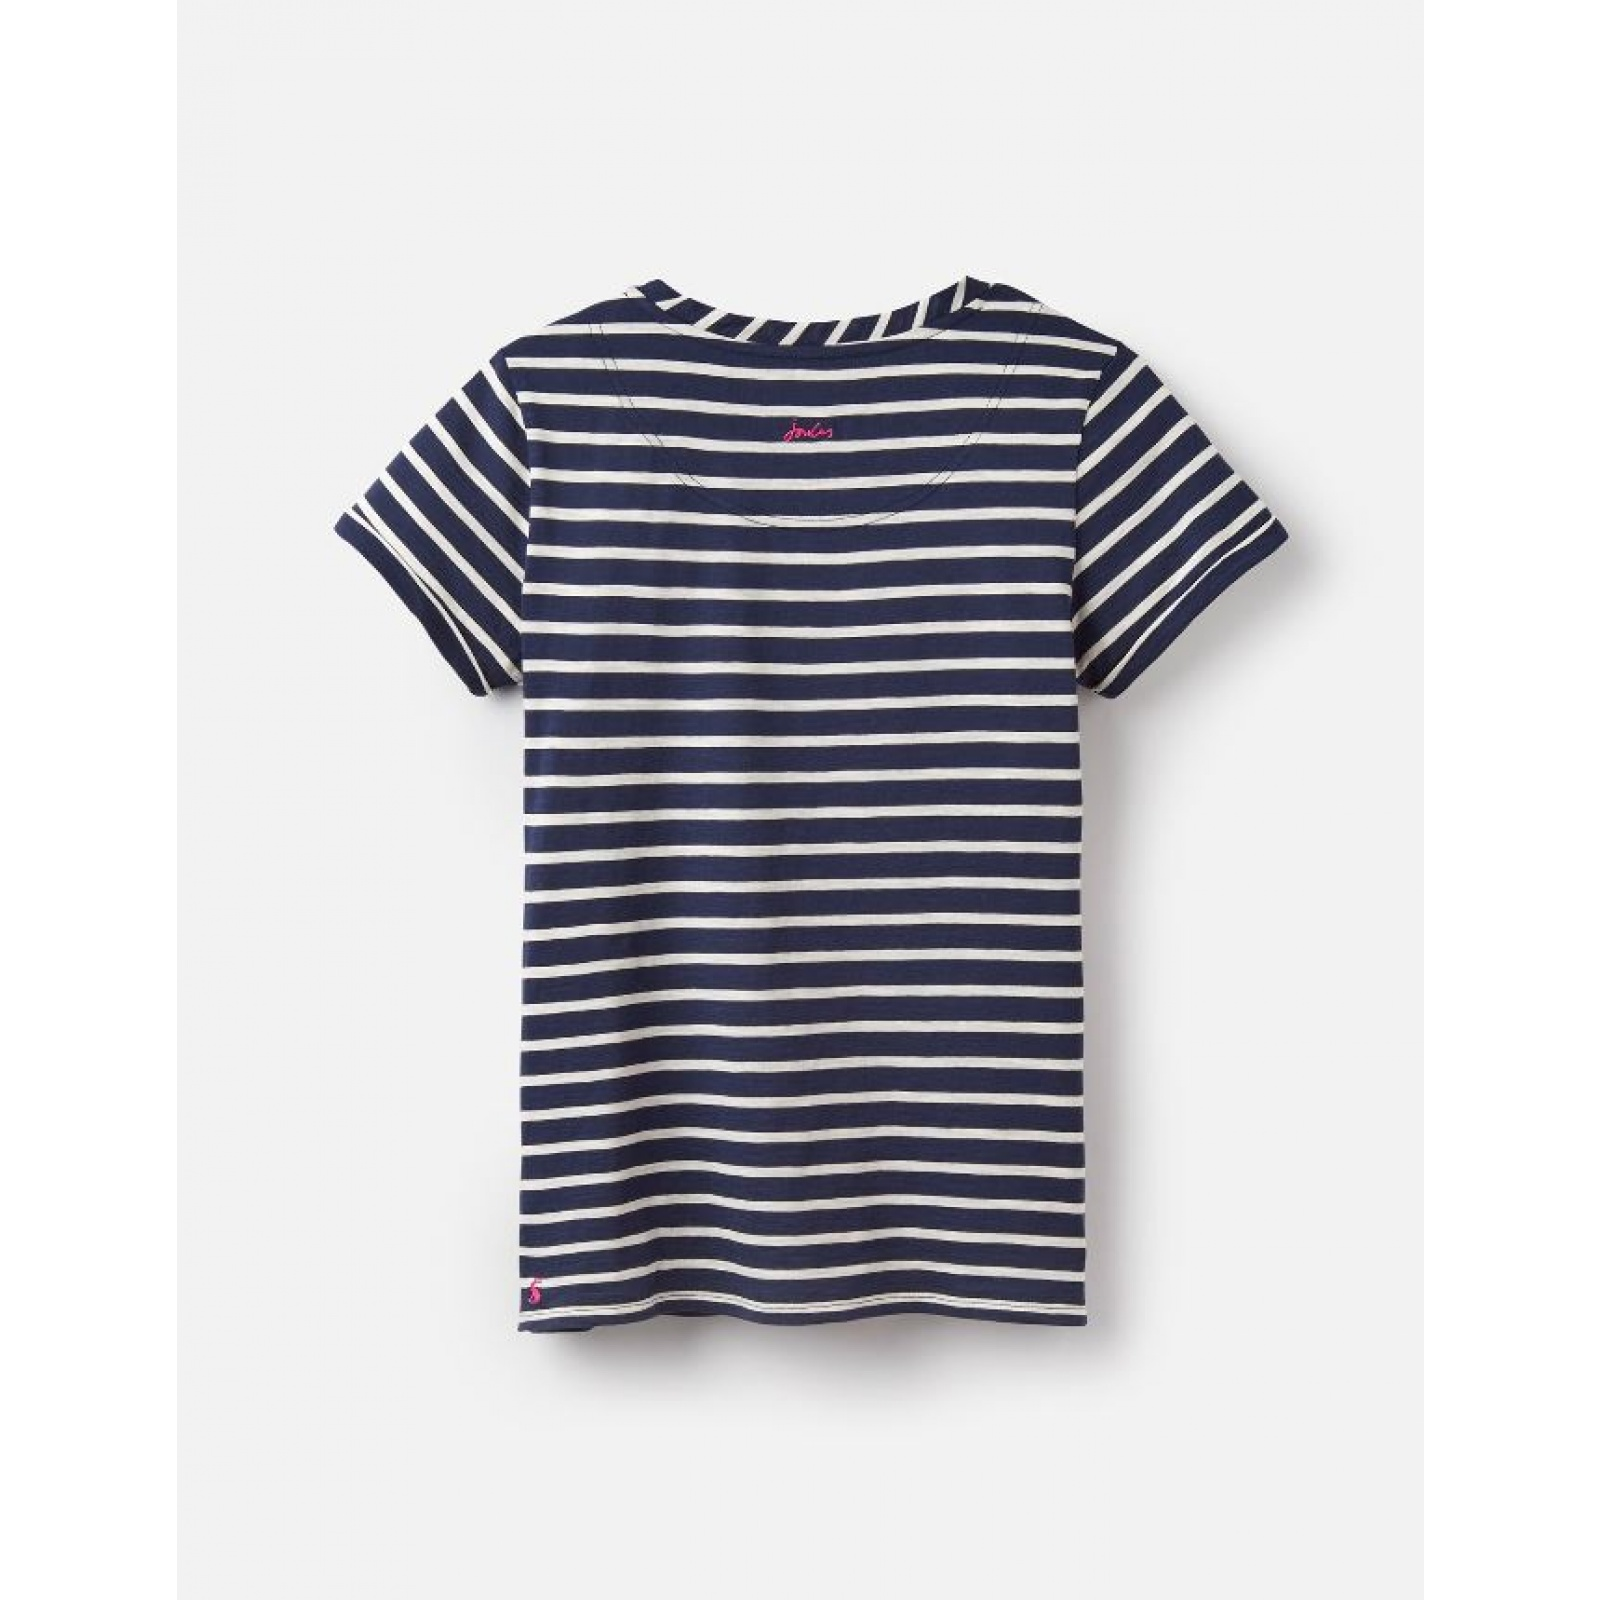 Joules-Nessa-Raya-Ligero-Jersey-Camiseta-SS19 miniatura 19